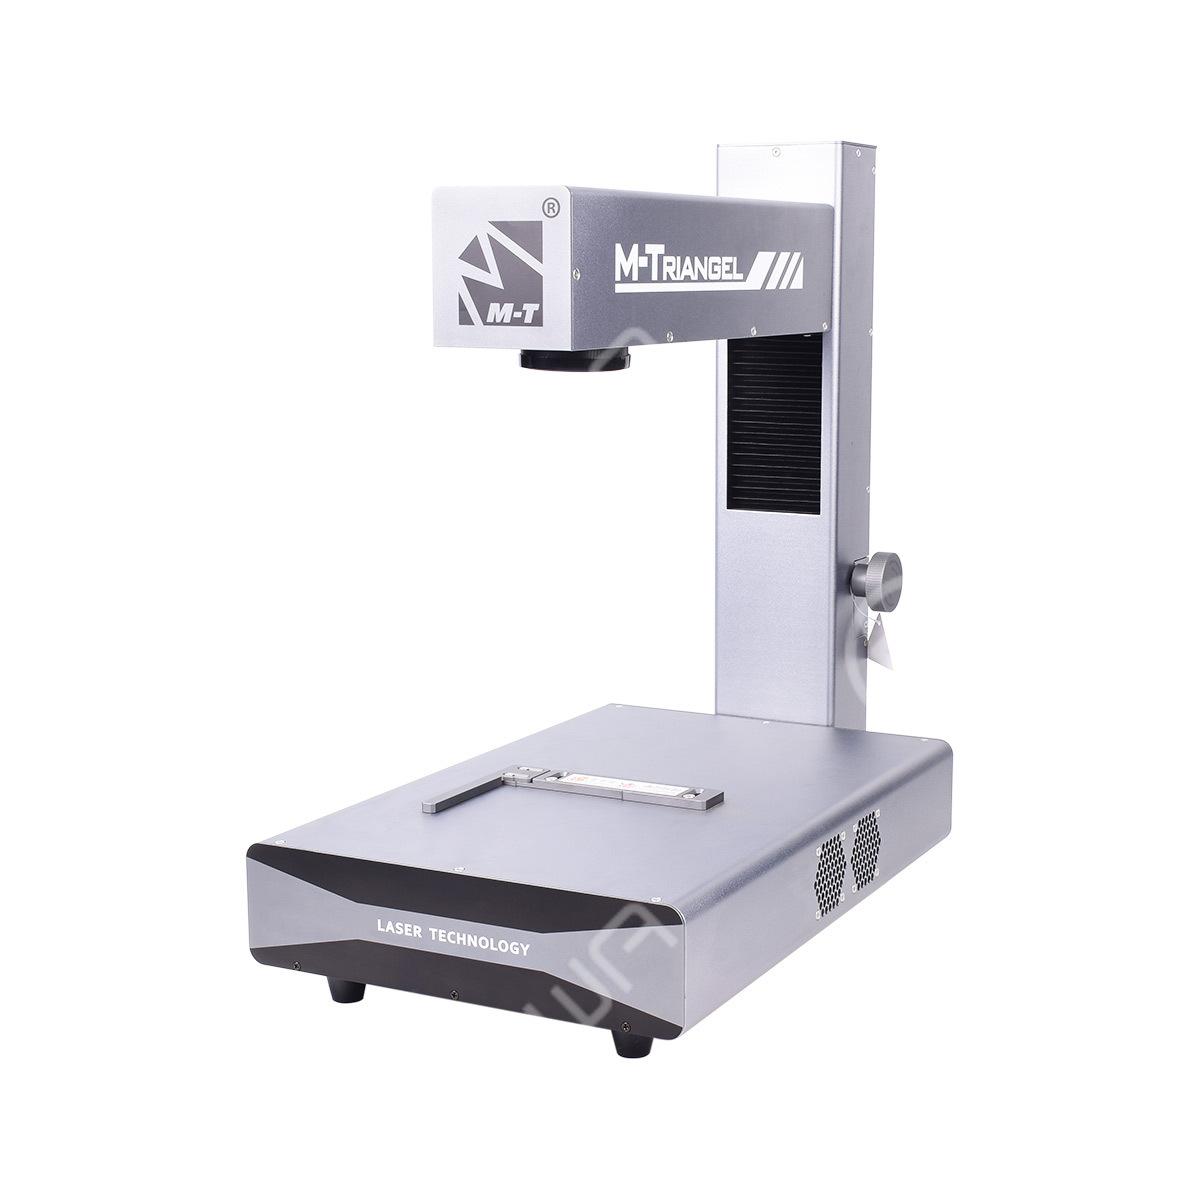 M-Triangle Mi One 20W Folding Type Power Engraving Laser Machine